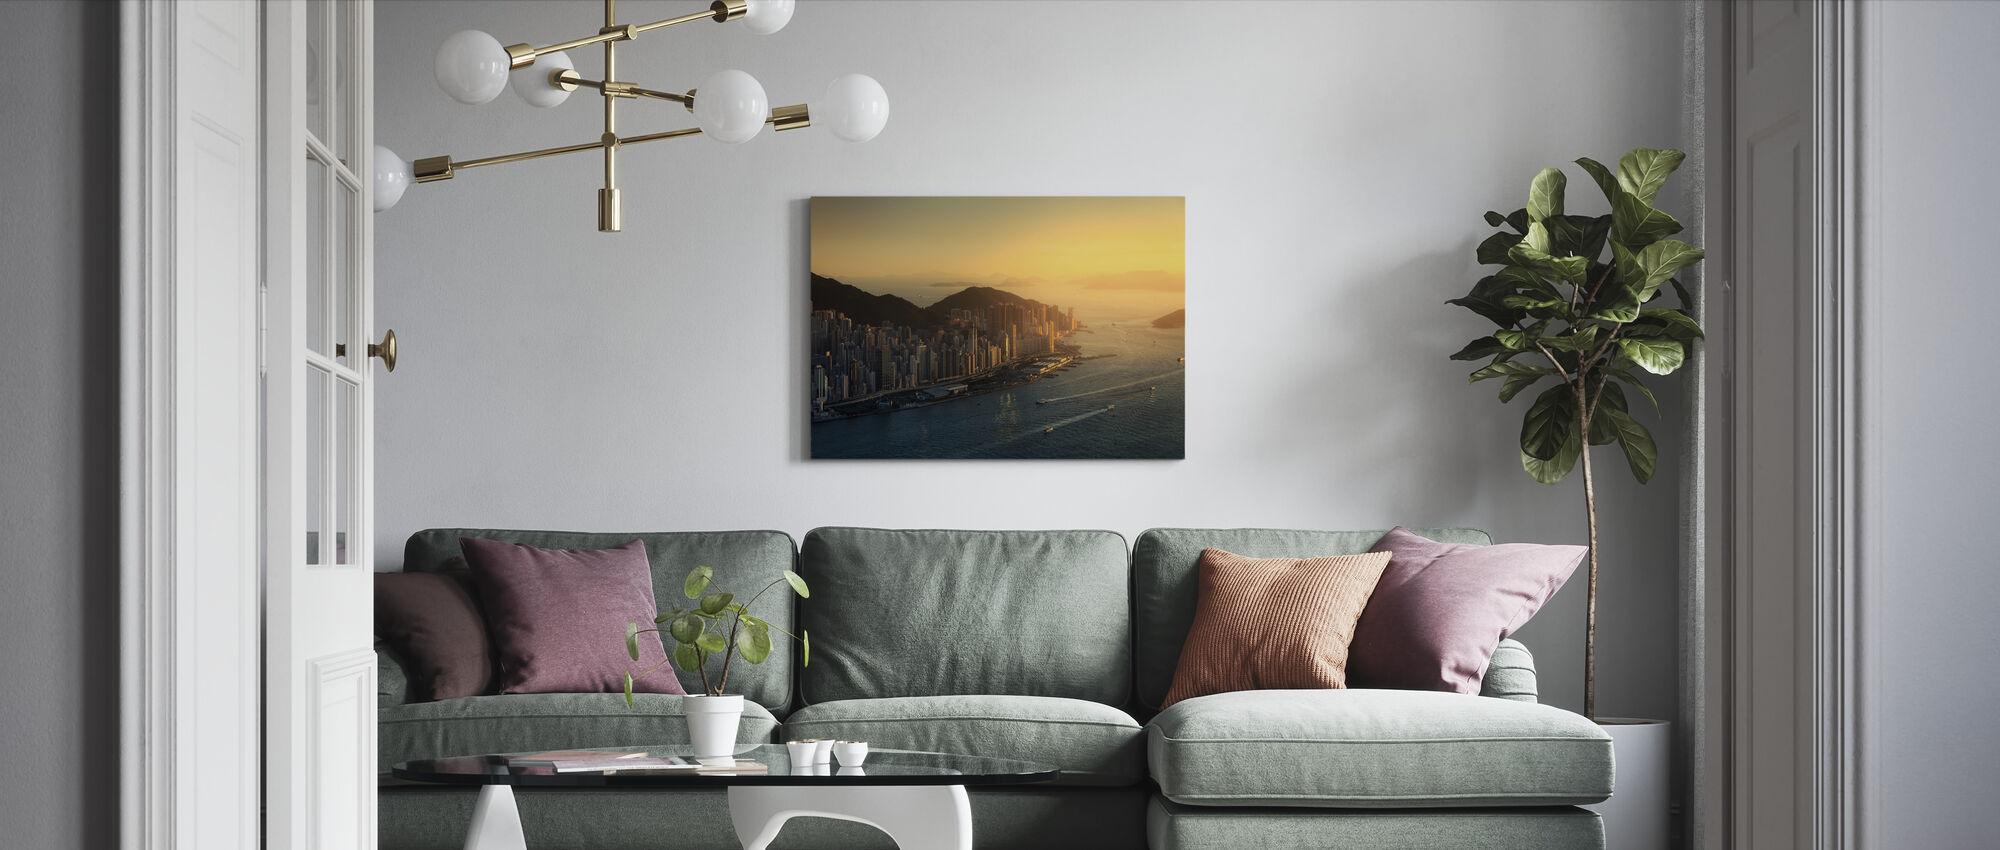 Kustlijn van Hongkong - Canvas print - Woonkamer